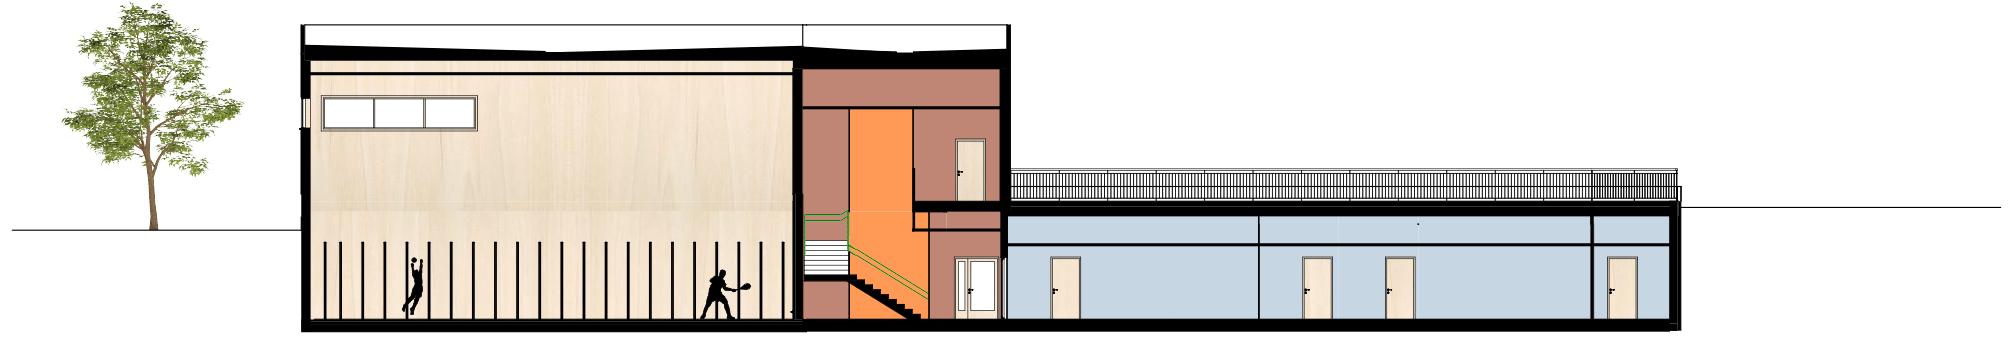 Planforum Arkitekter_ Hebekkskole_Section Sport Hall.jpg